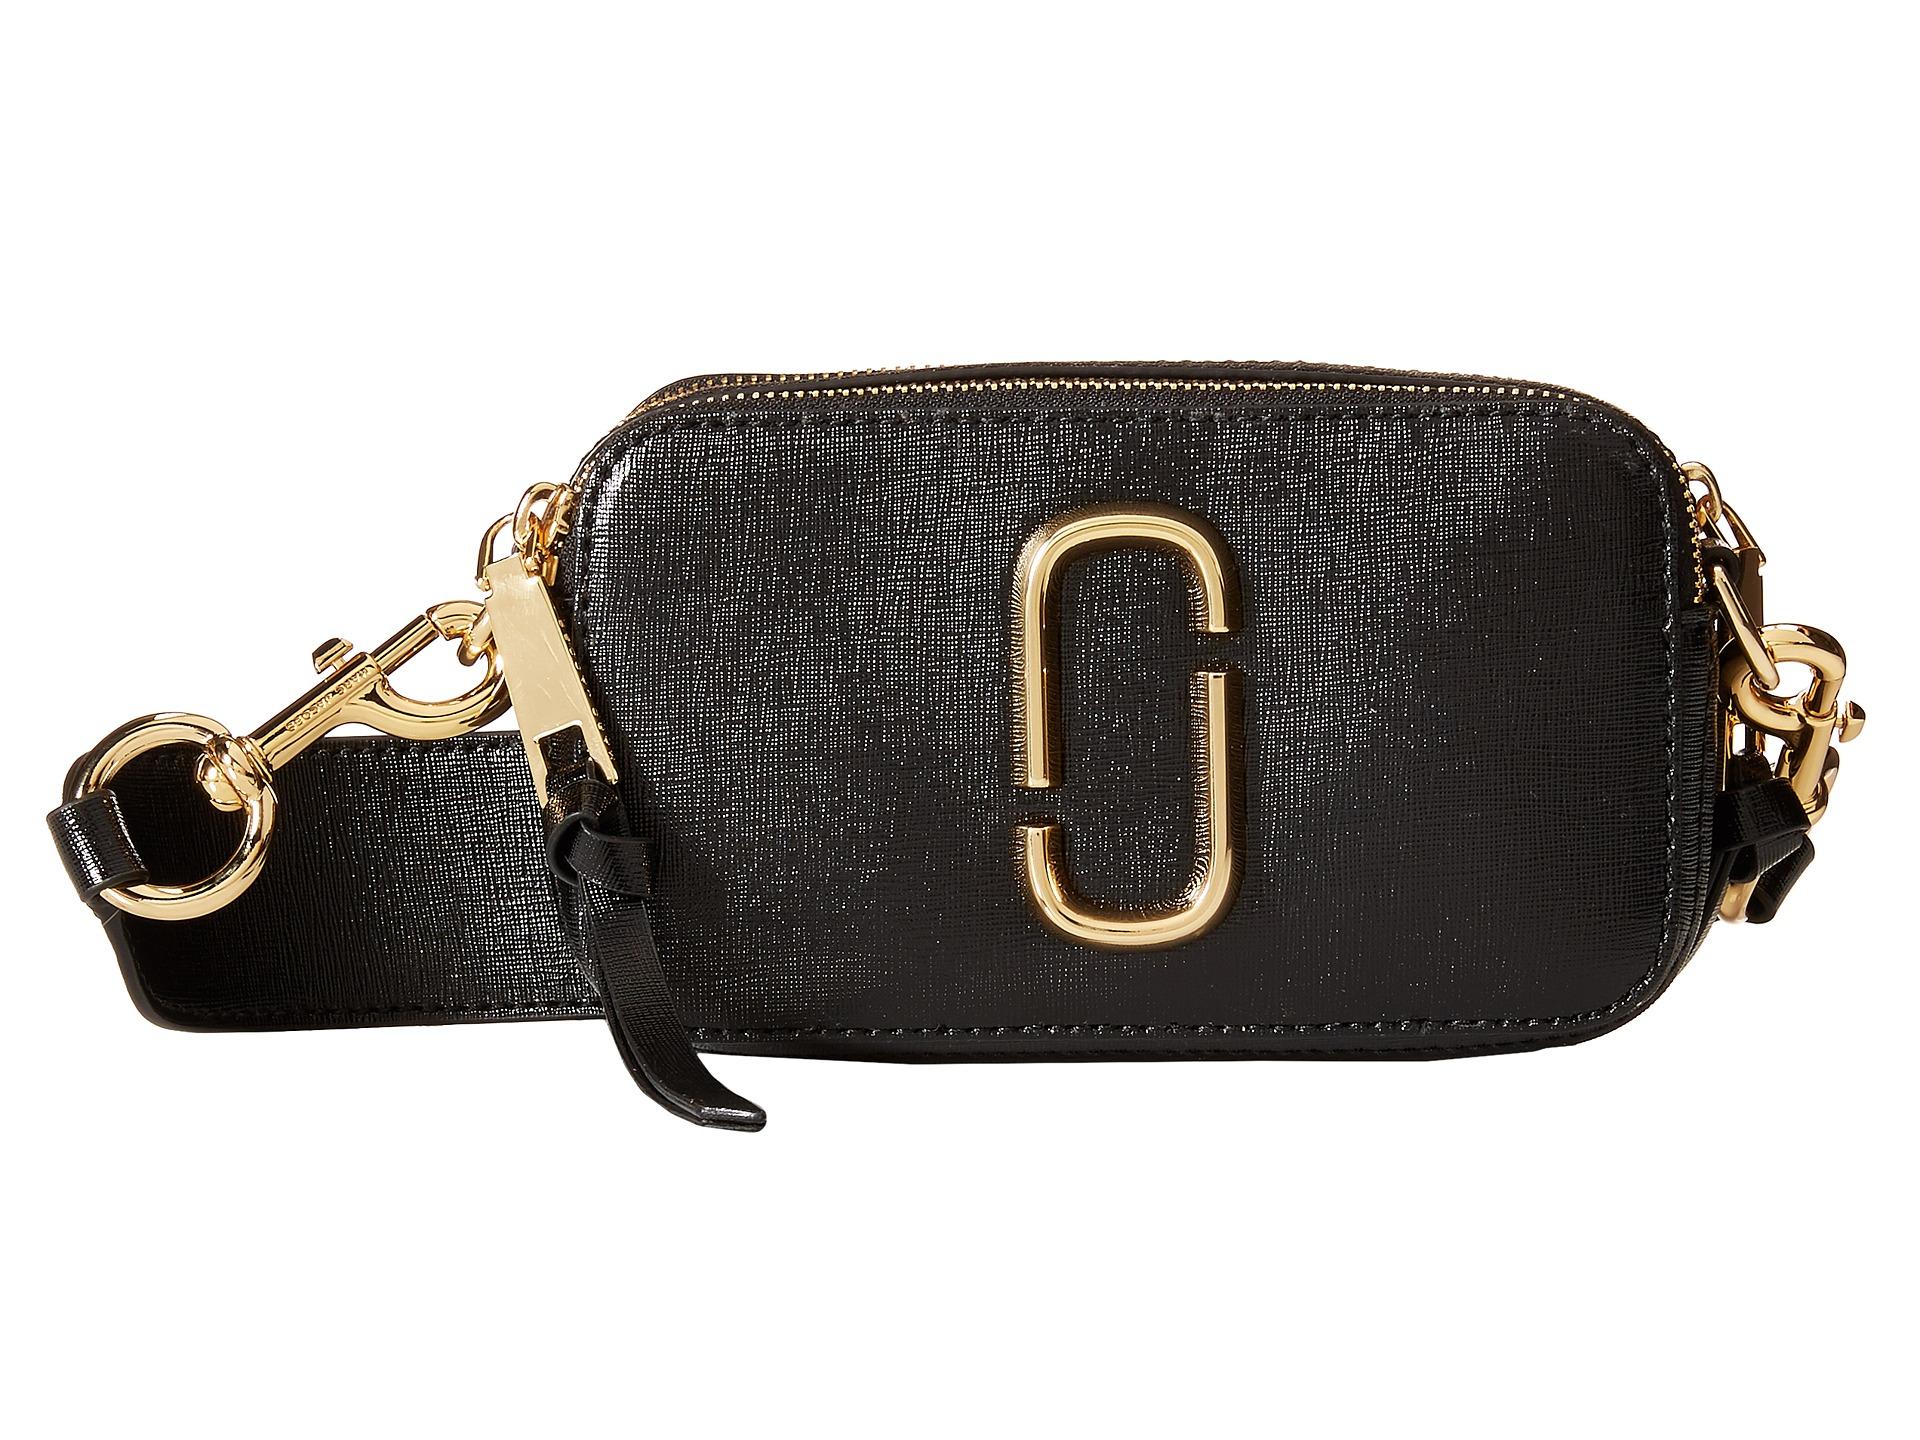 5d9a4cbb720e Lyst - Marc Jacobs Snapshot Color Block Saffiano Small Camera Bag in ...